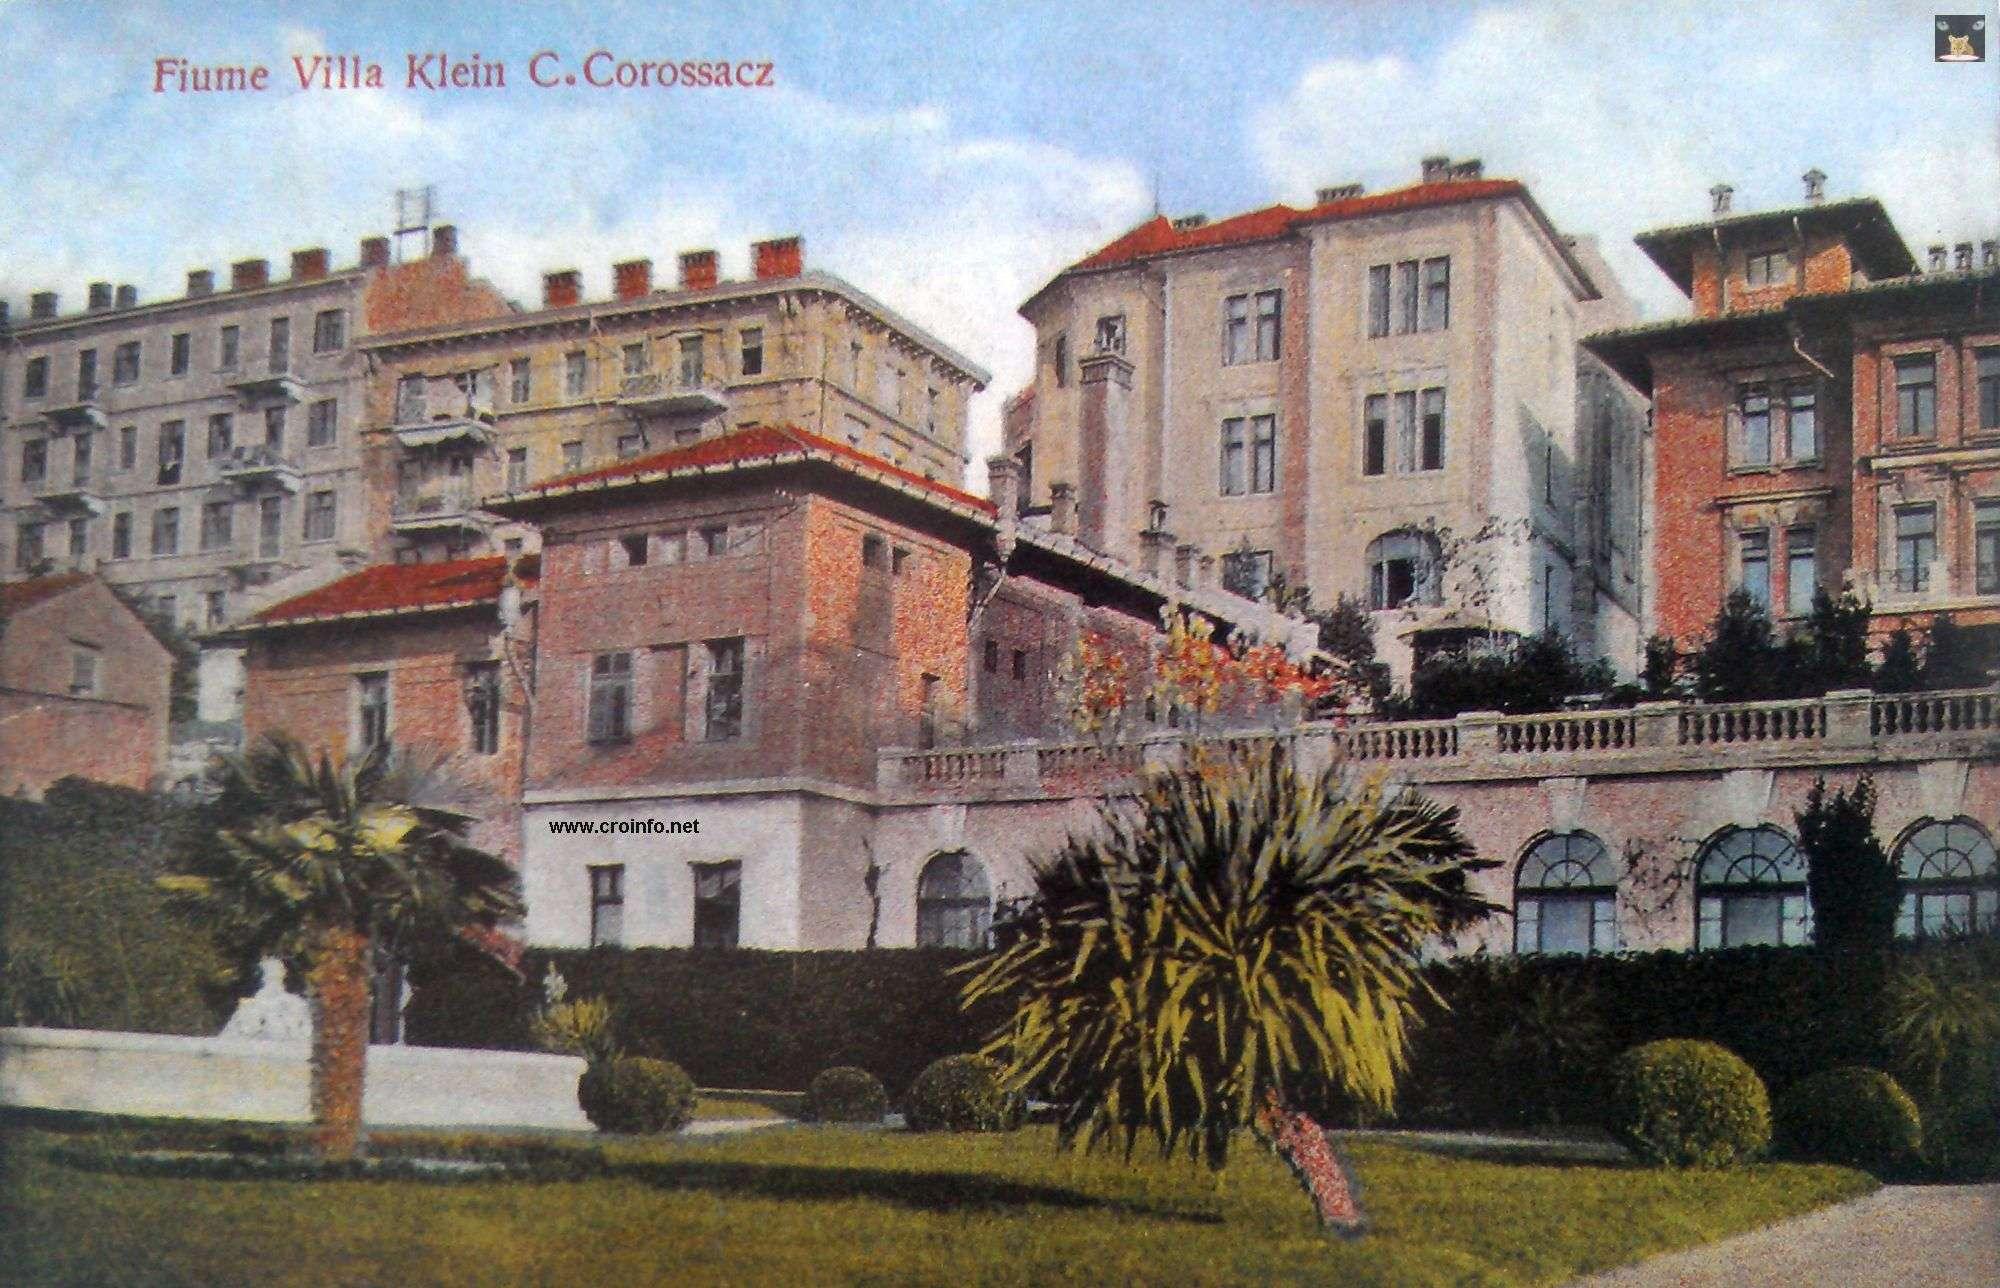 Villa Klein C.Corossacz